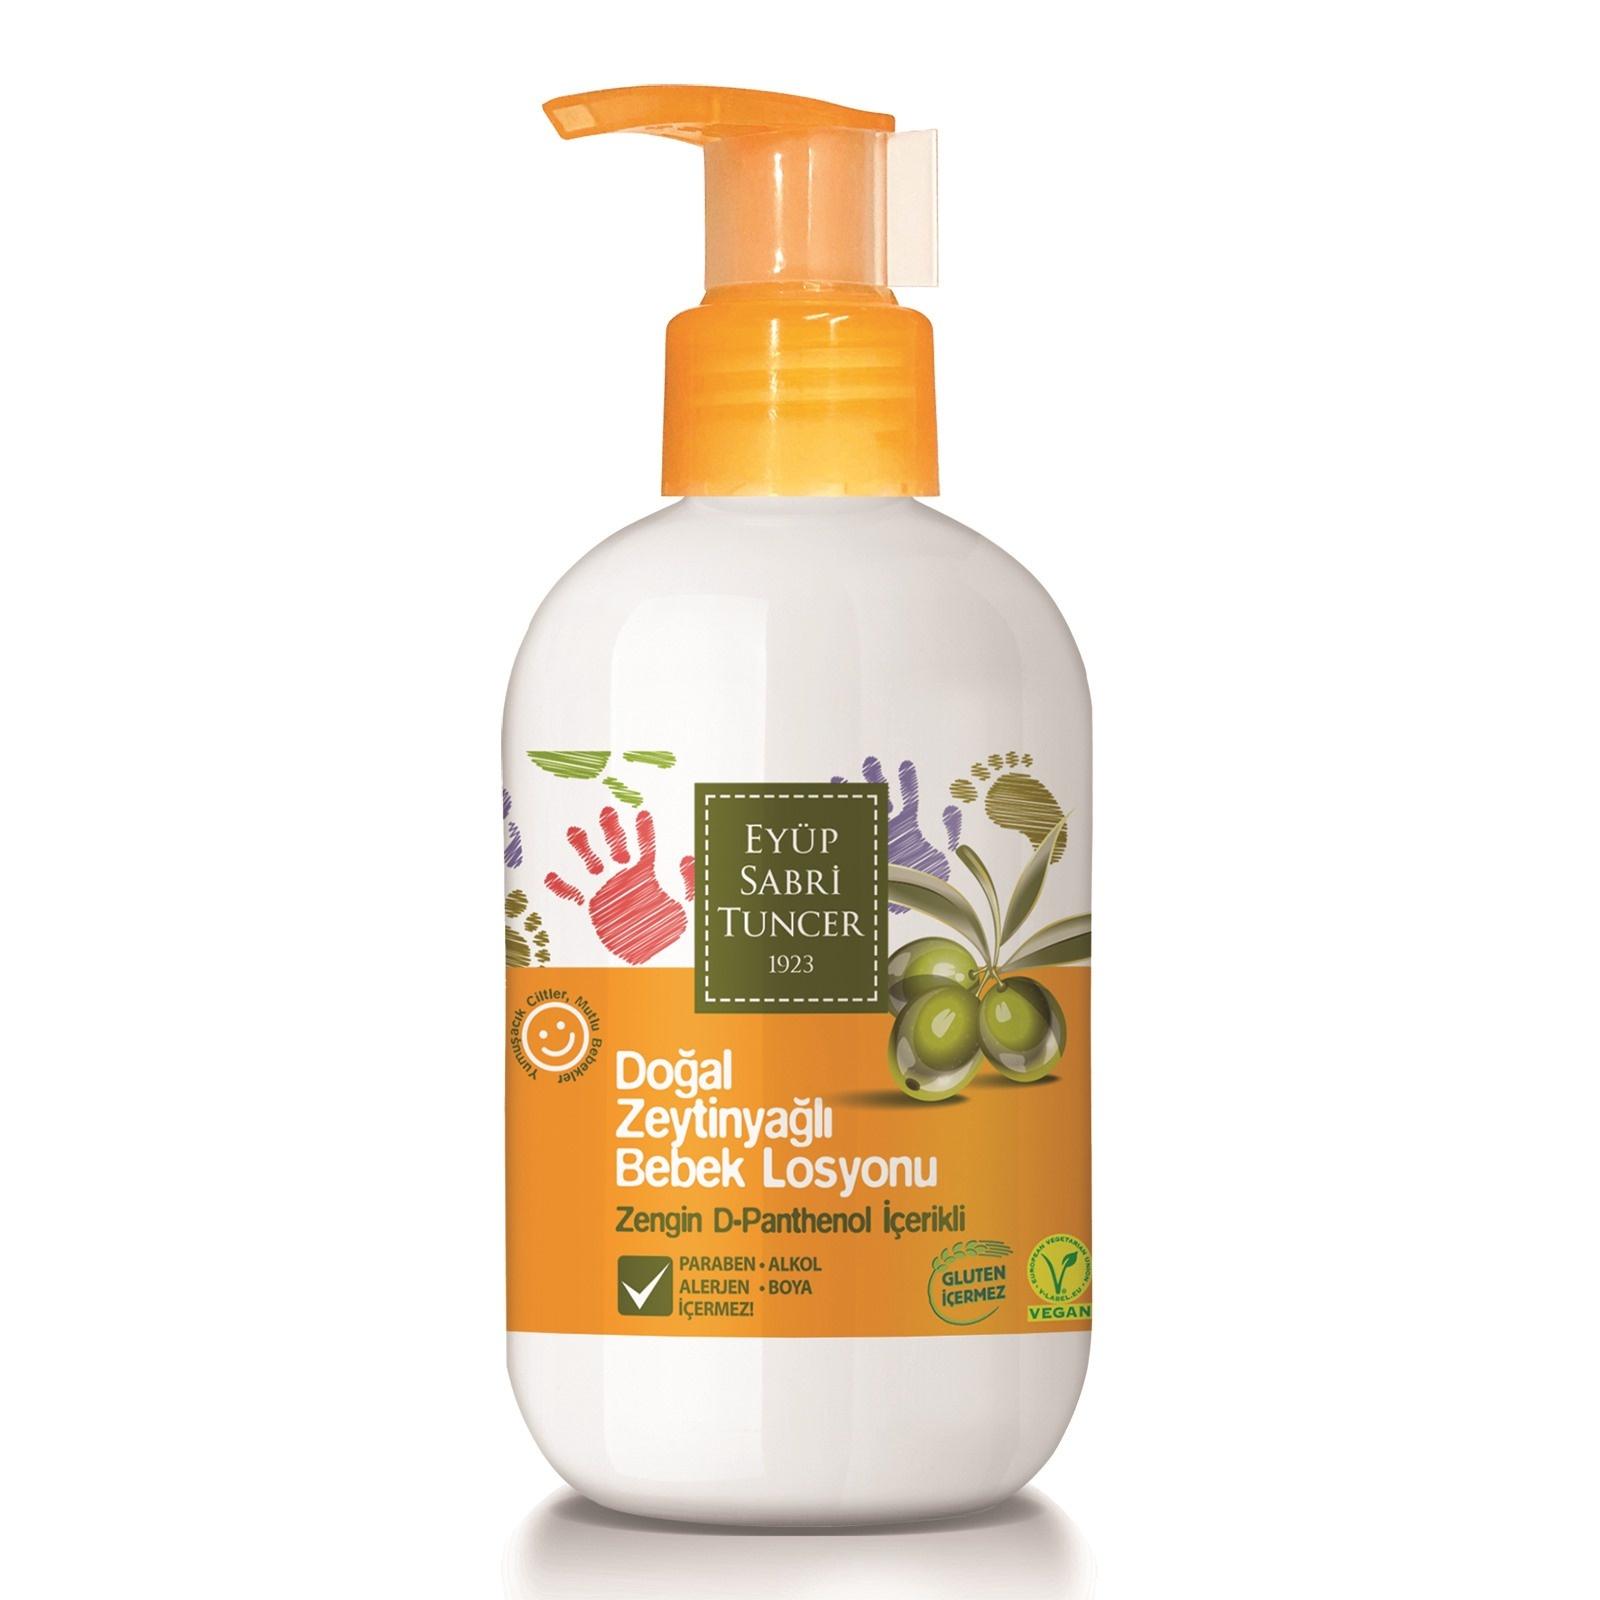 Eyup Sabri Tuncer Natural Olive Oil Baby Lotion 280 Ml